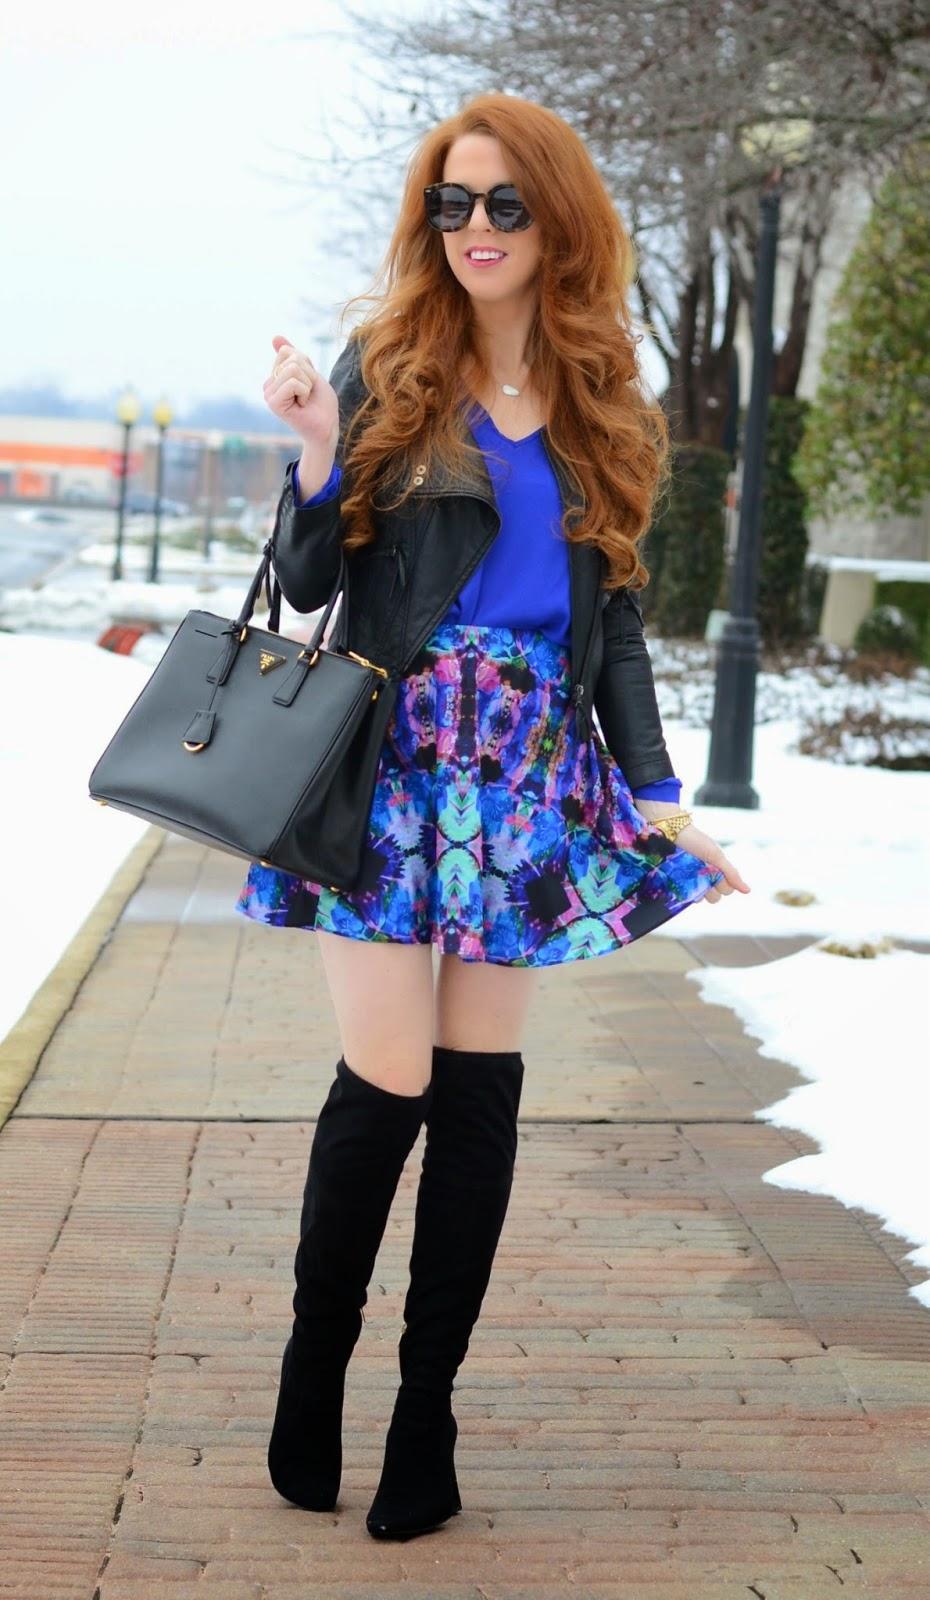 mini skirt jimmy choos and tennis shoes bloglovin